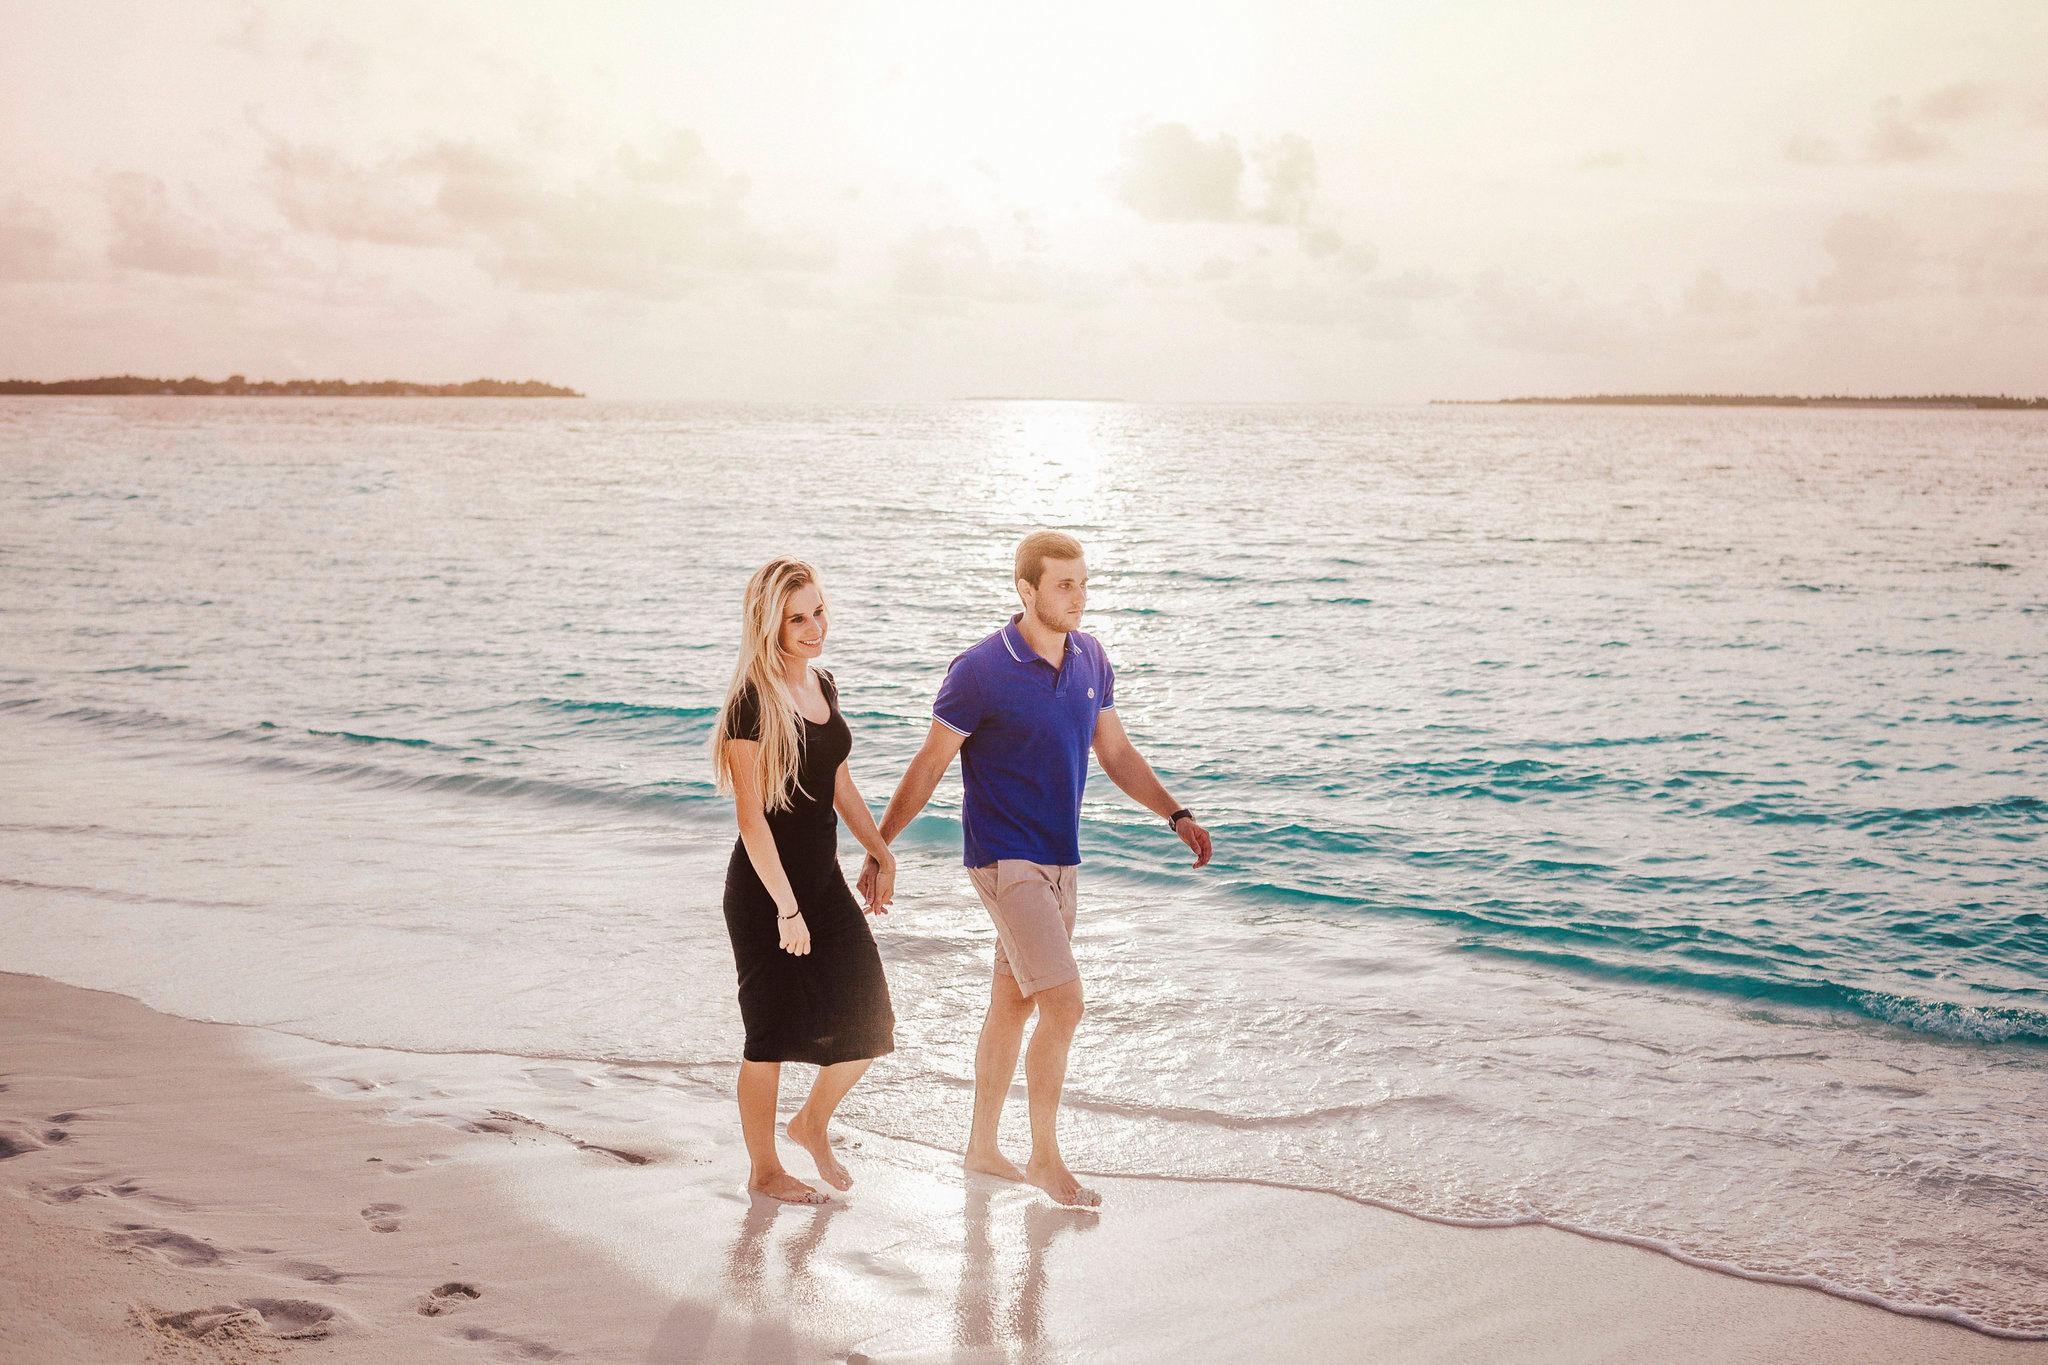 060-maldives-engagement-photographer.jpg